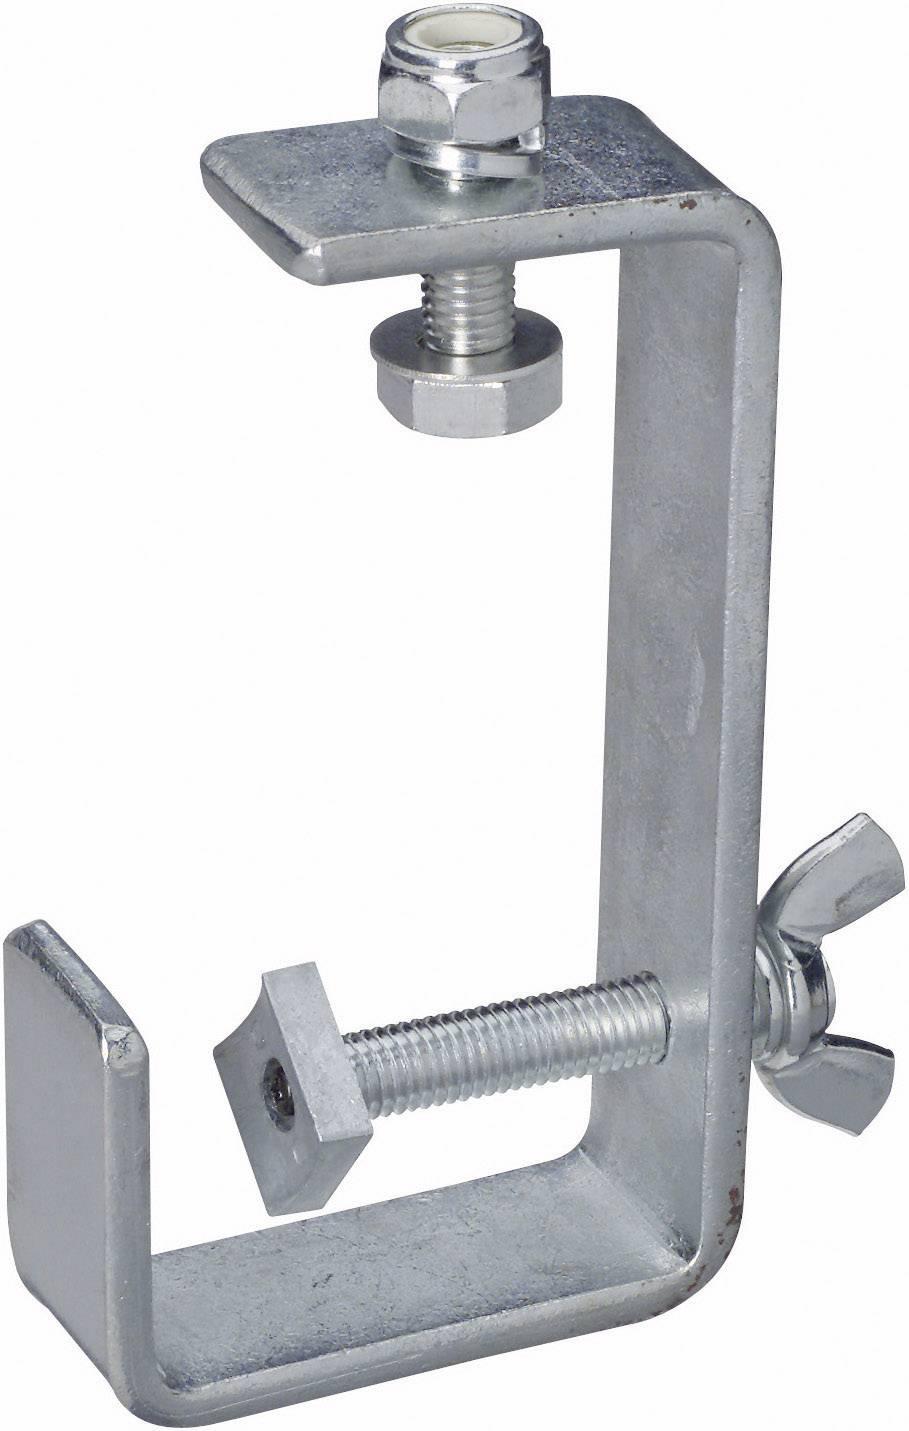 Držák reflektoru, max. 15 kg, stříbrná